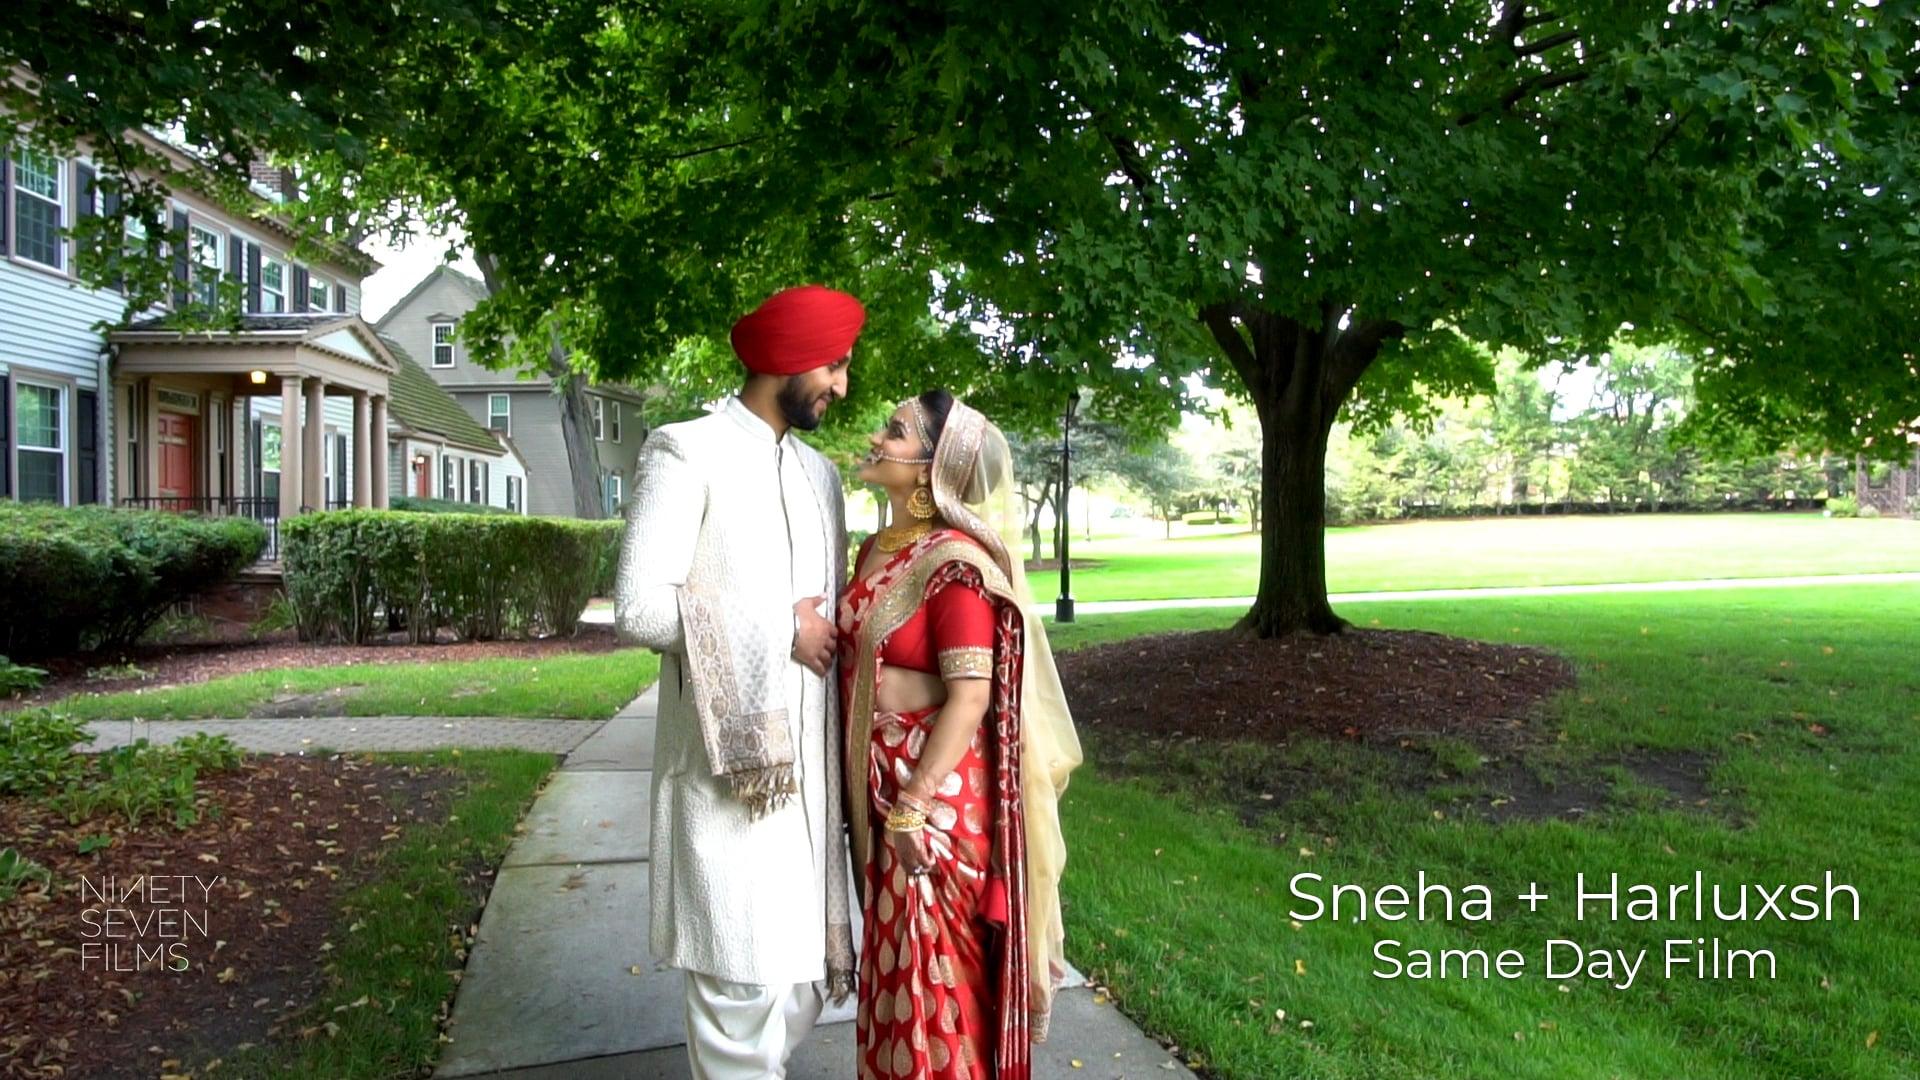 The Dearborn Inn Sikh & Hindu Wedding | Sneha + Harluxsh Same Day Film